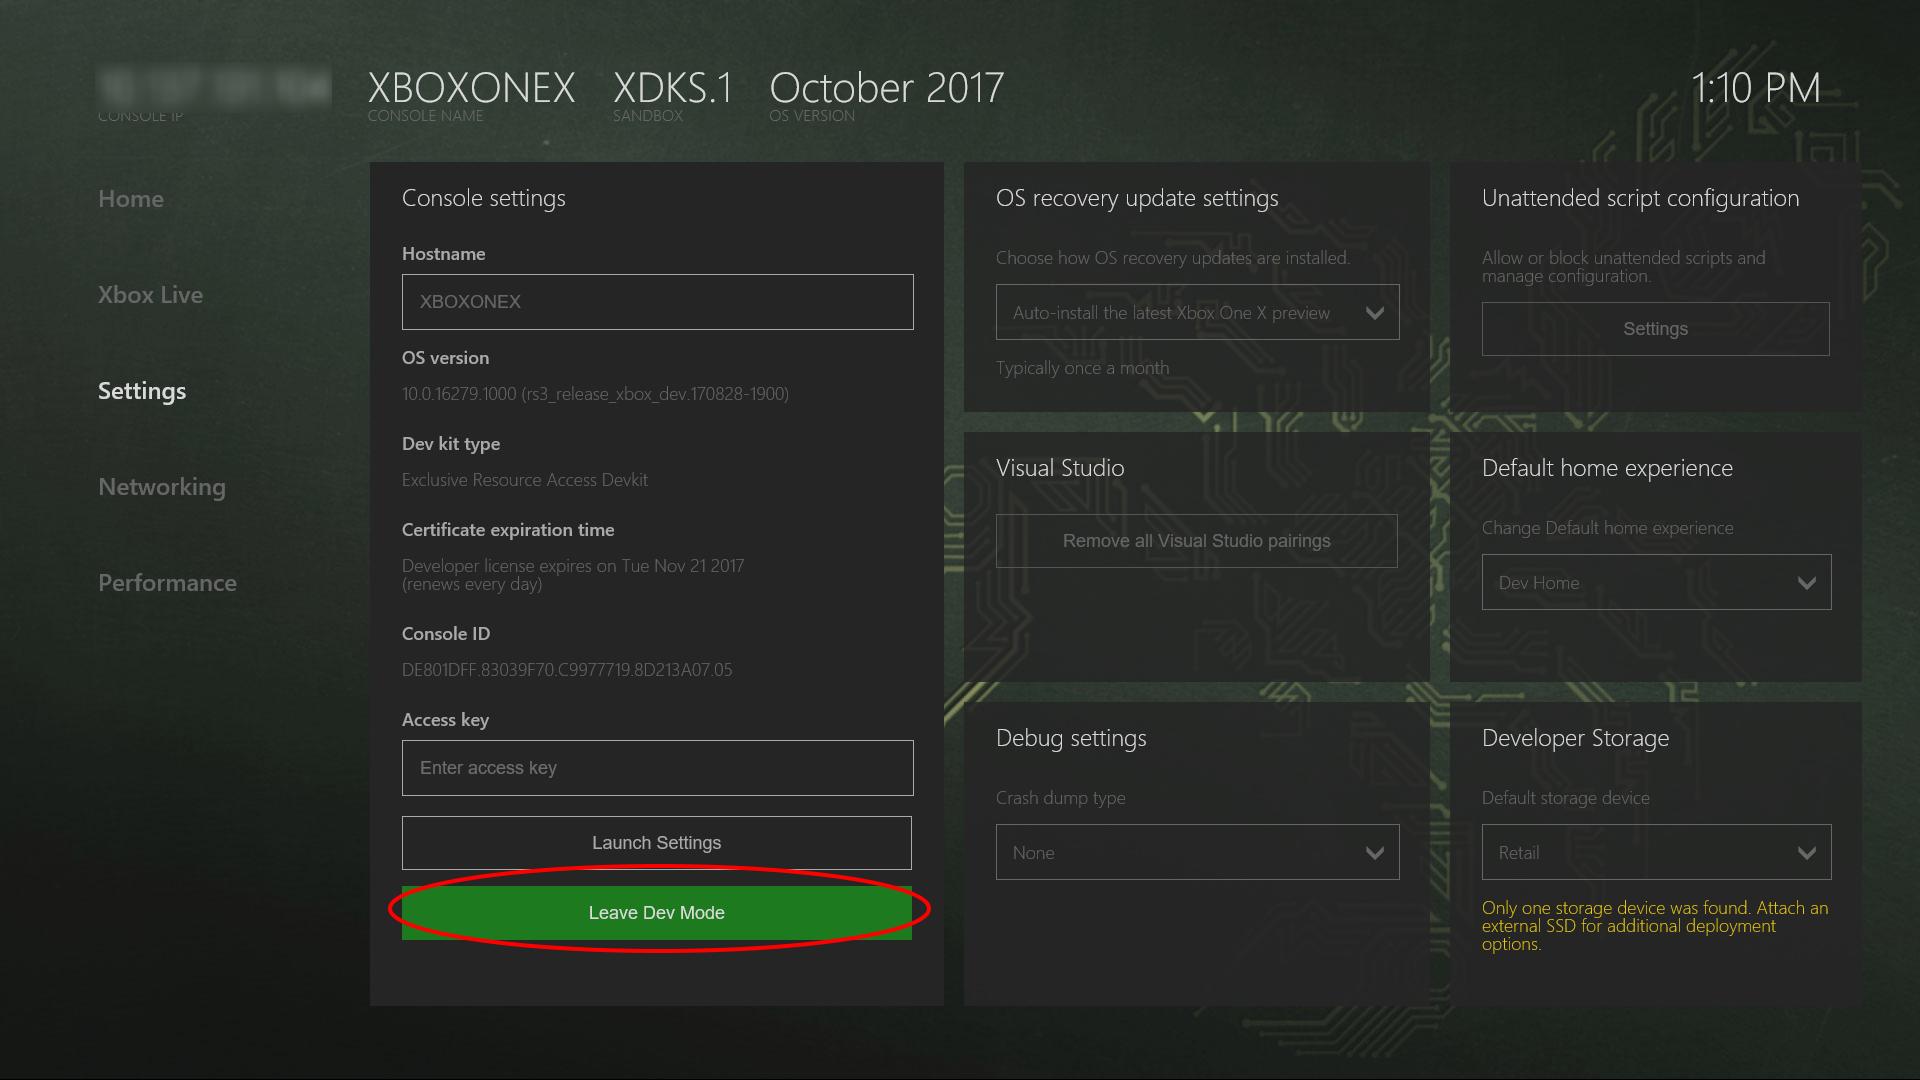 deactivate tableau desktop key